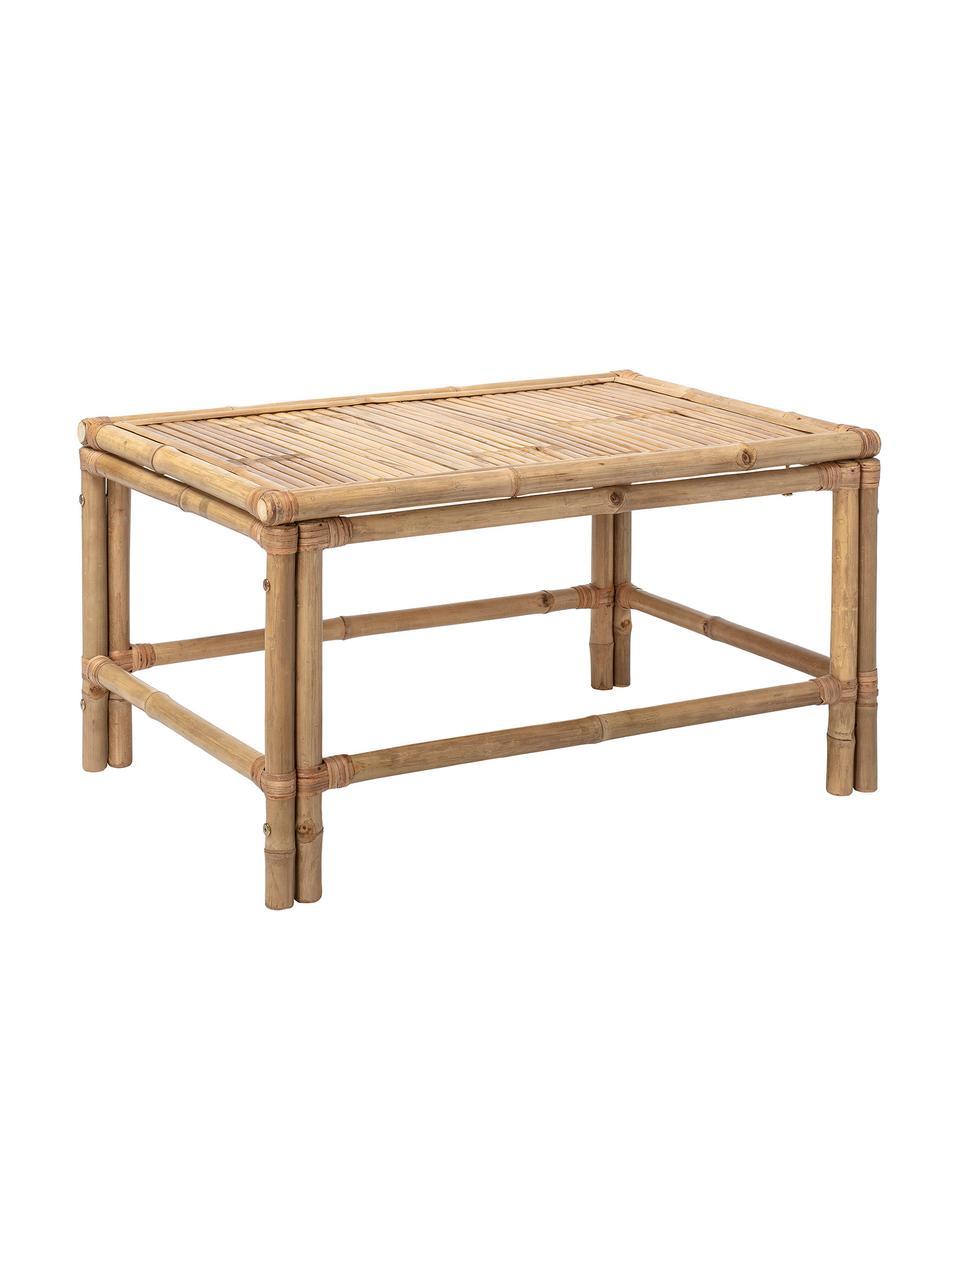 Tavolino da salotto in bambù Sole, Bambù, Beige, Larg. 90 x Alt. 50 cm